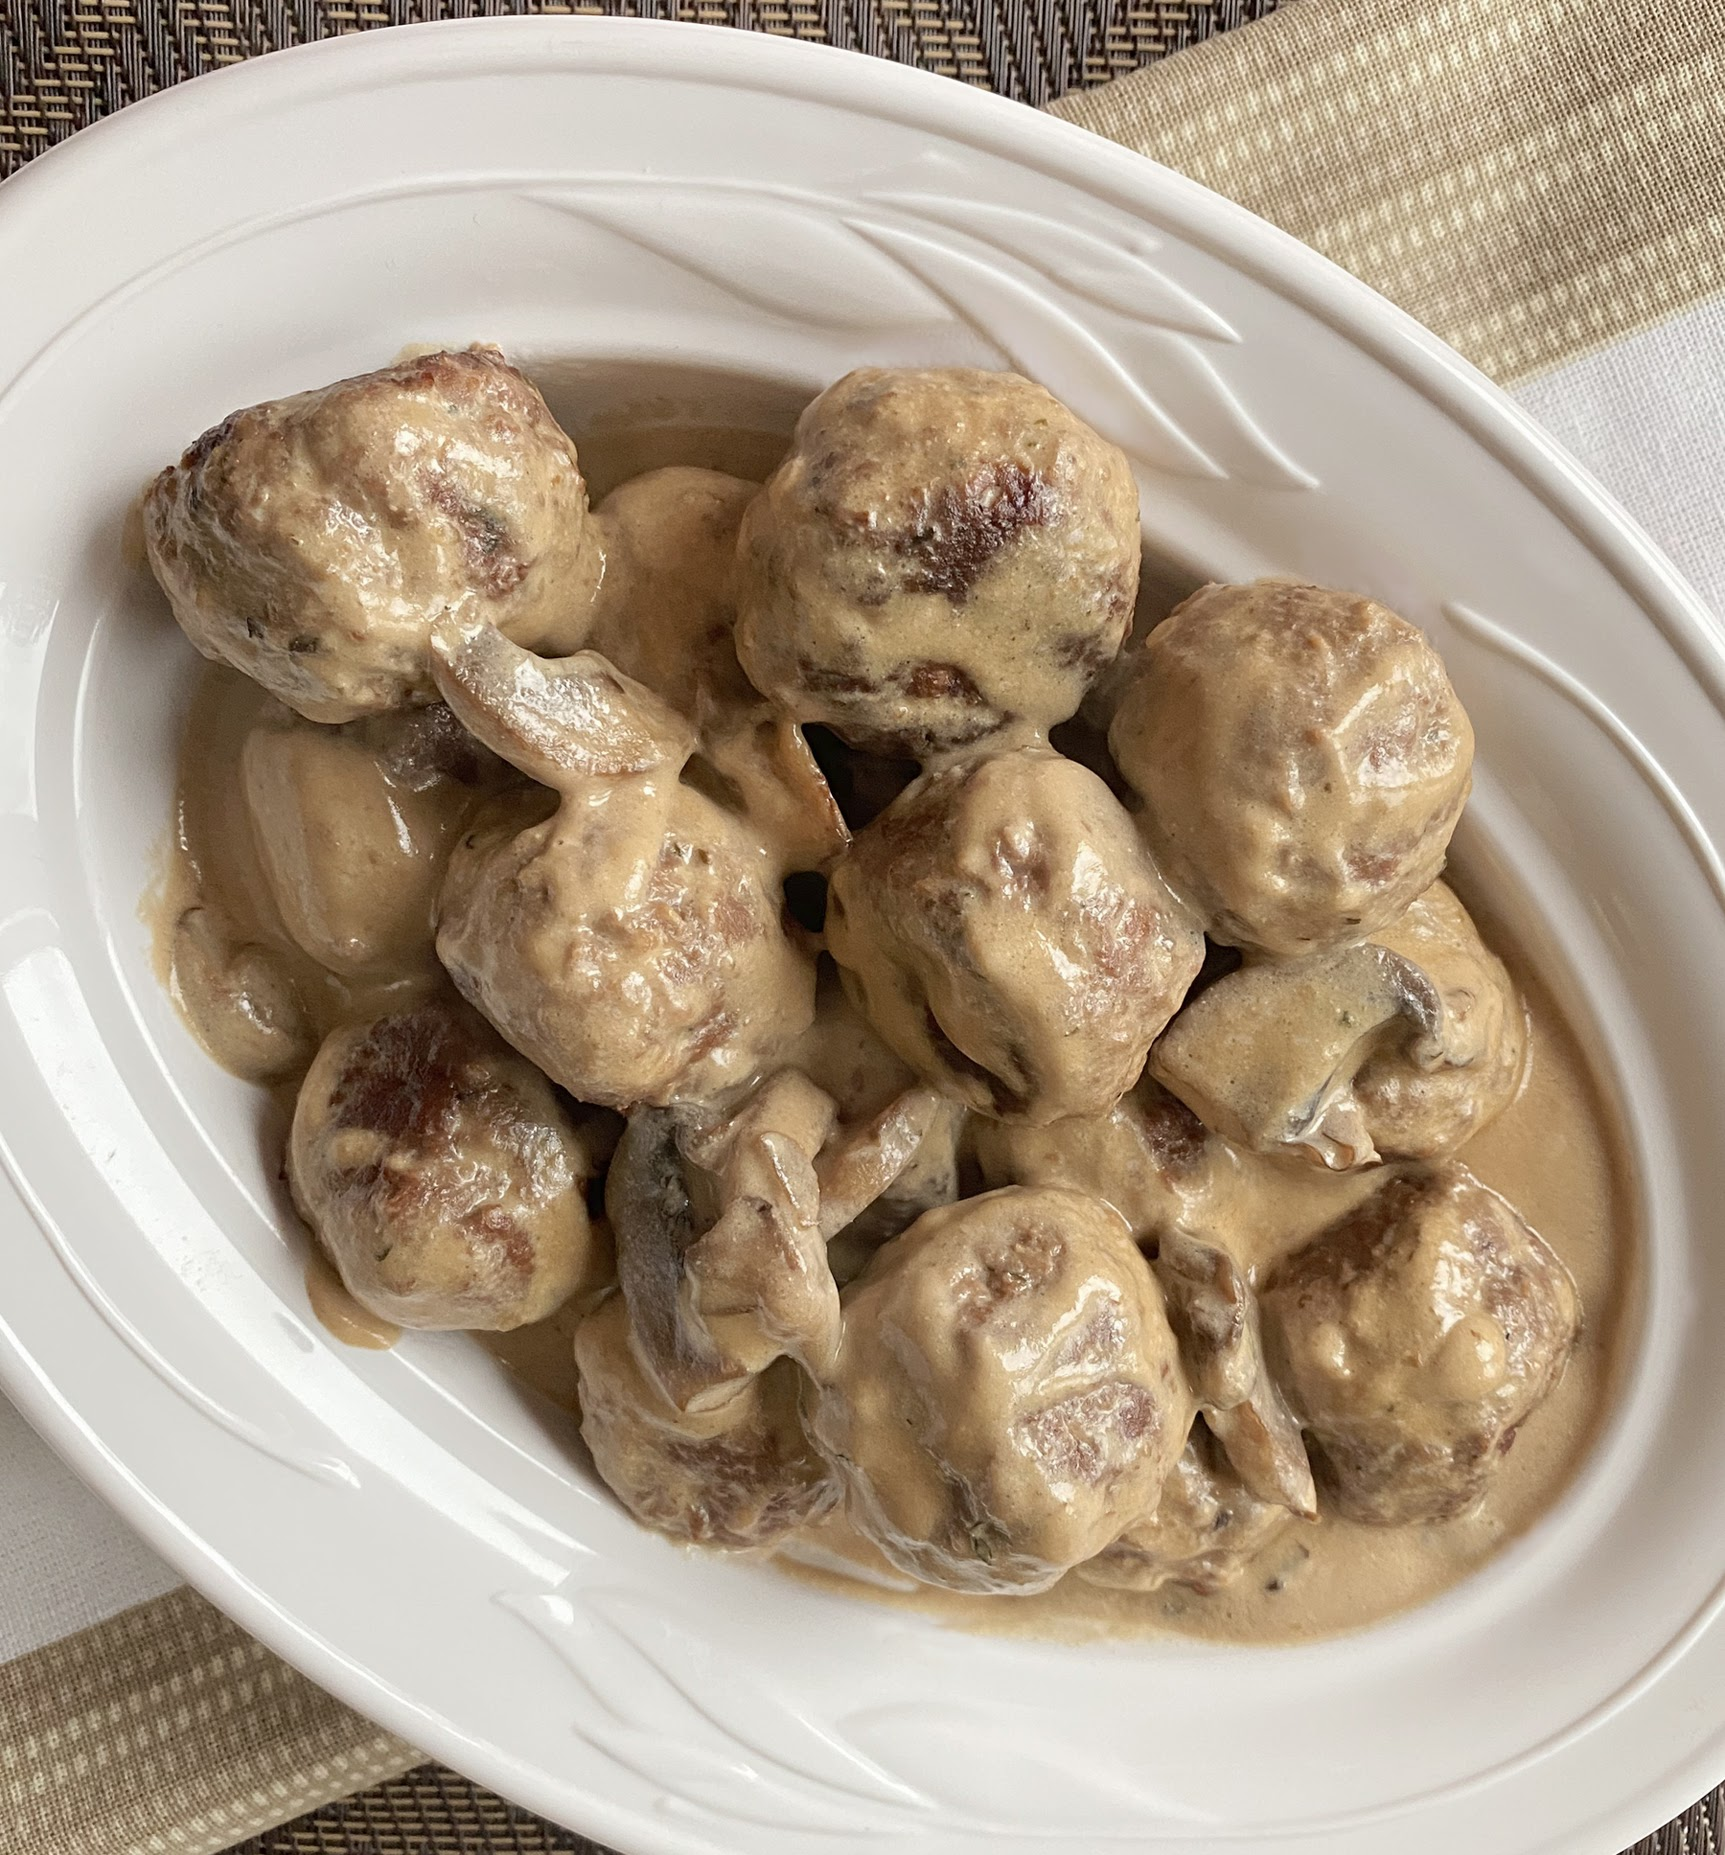 Impossible™ Swedish Meatballs